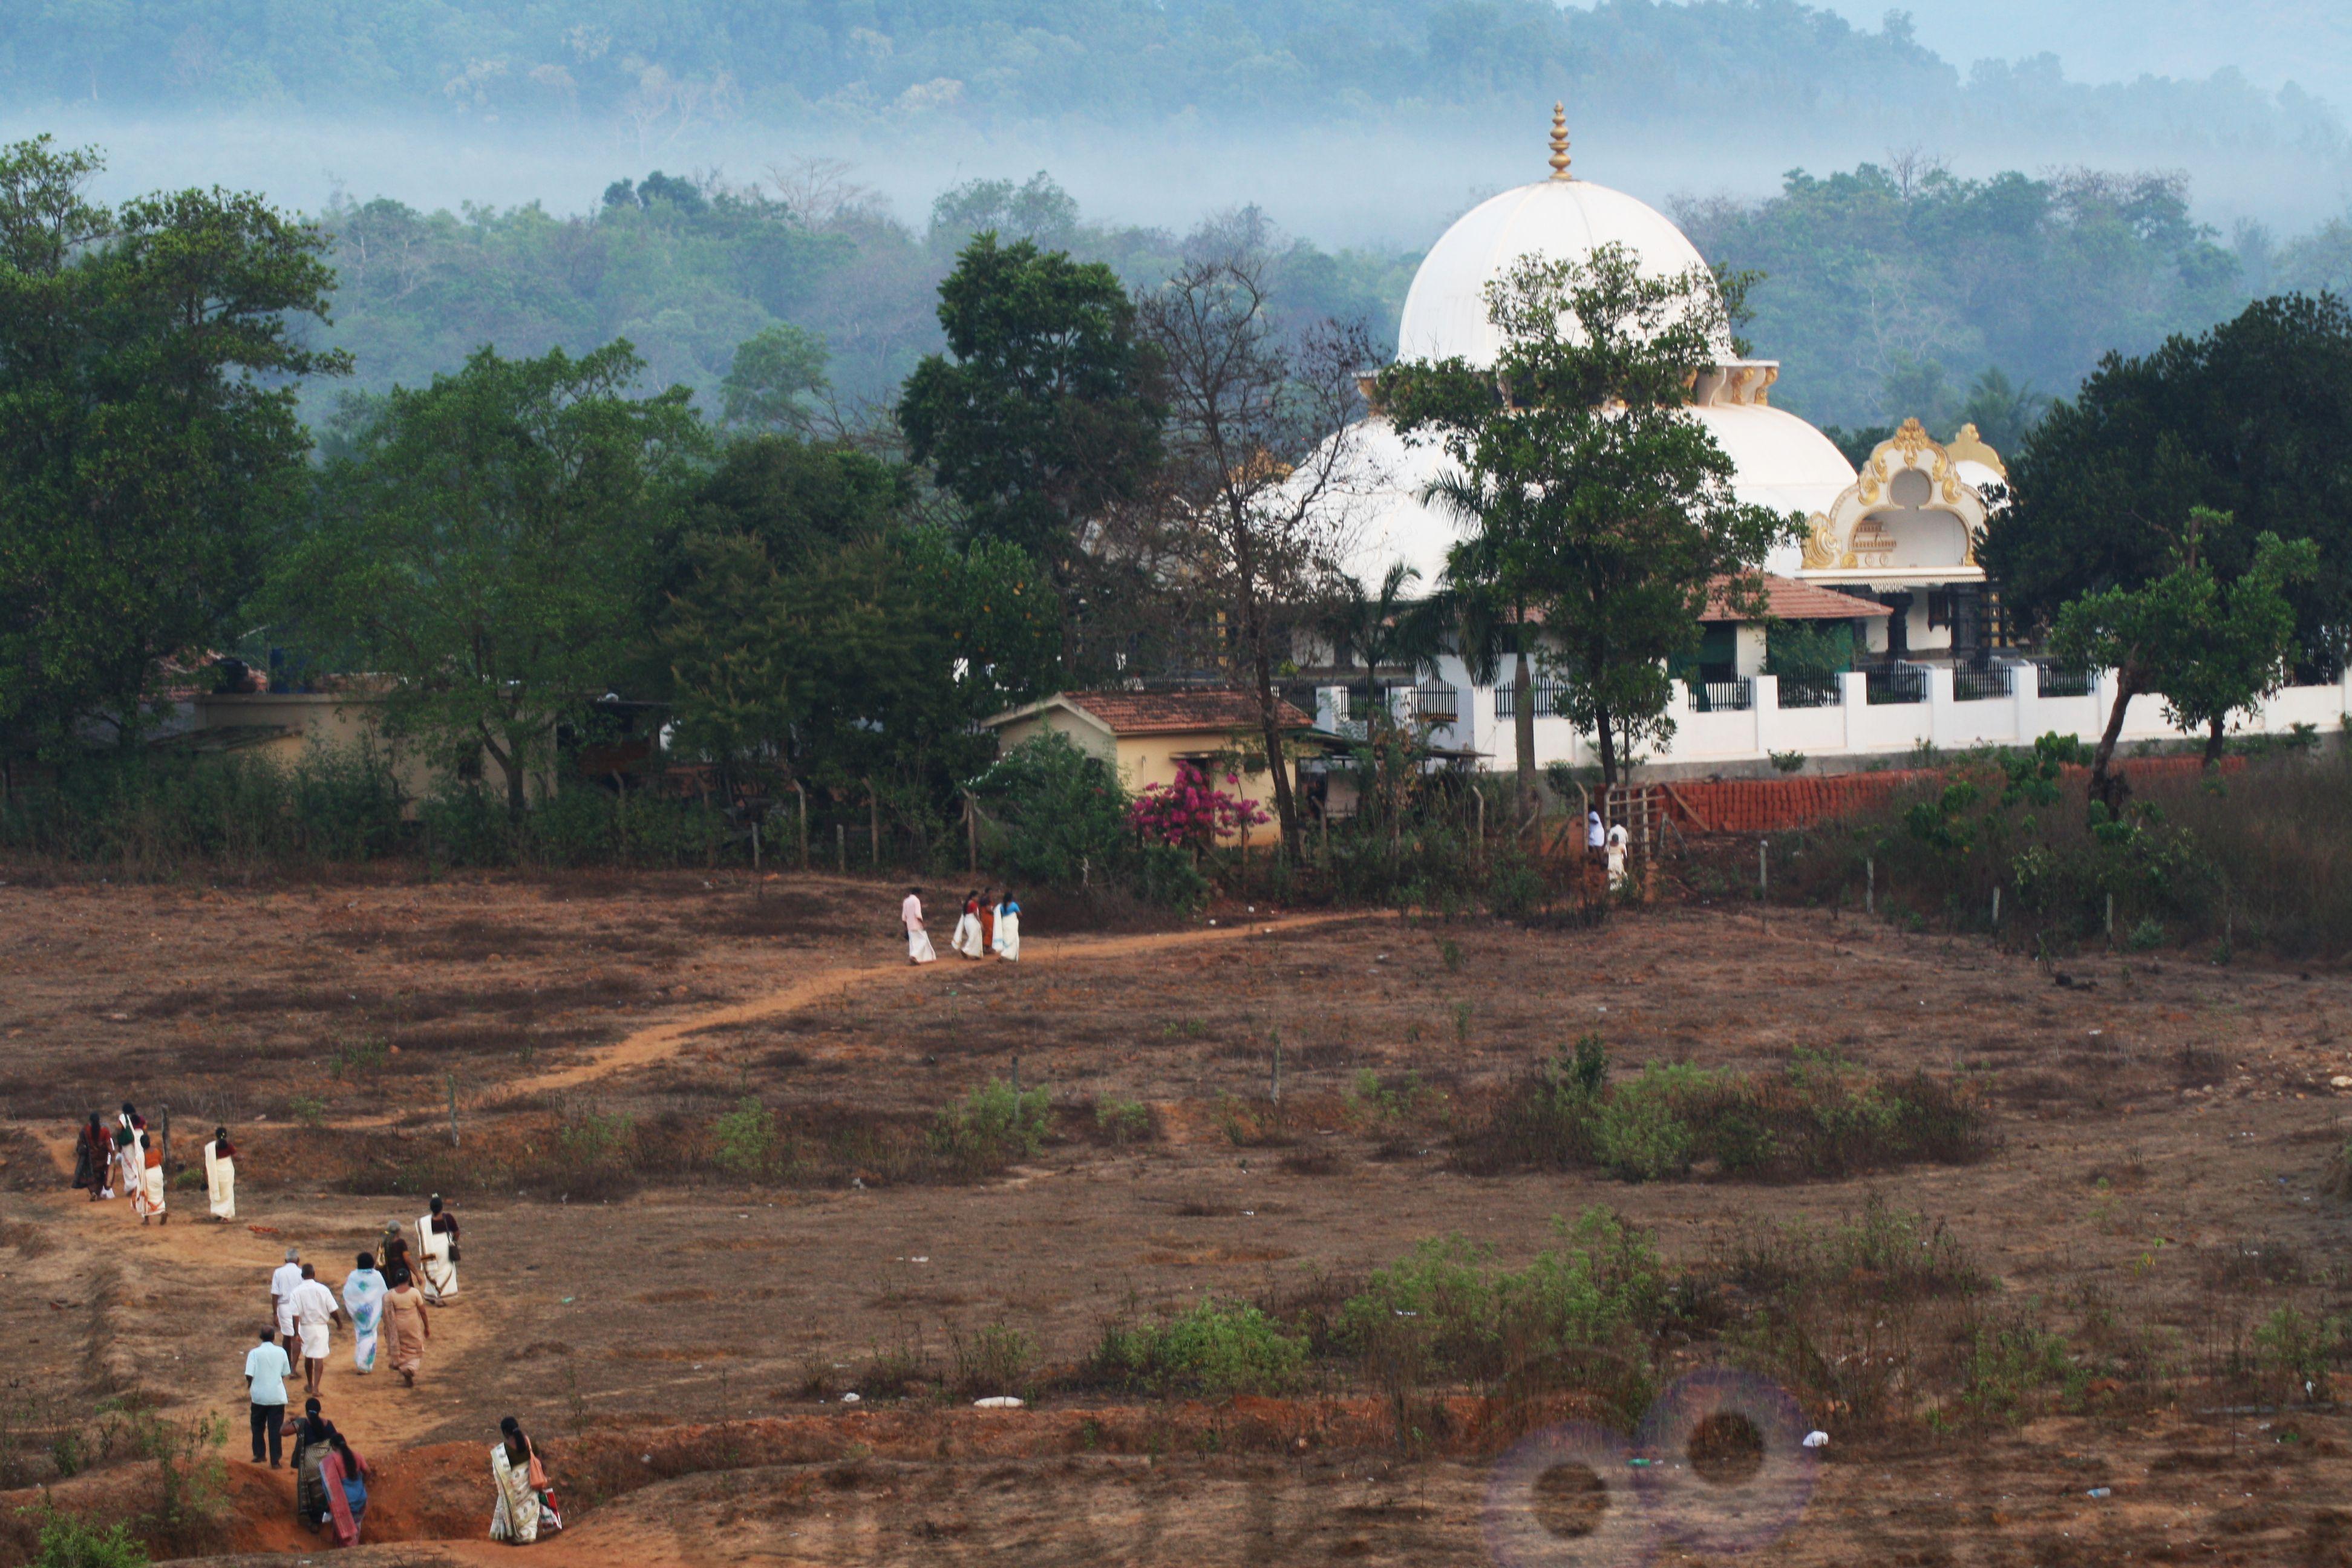 faith,followers,religion,mookambika,math,monastery,saturday,F,a-z,pravin,pm,phenomenon,throo da looking glass,bangalore,karnataka,Mangalore